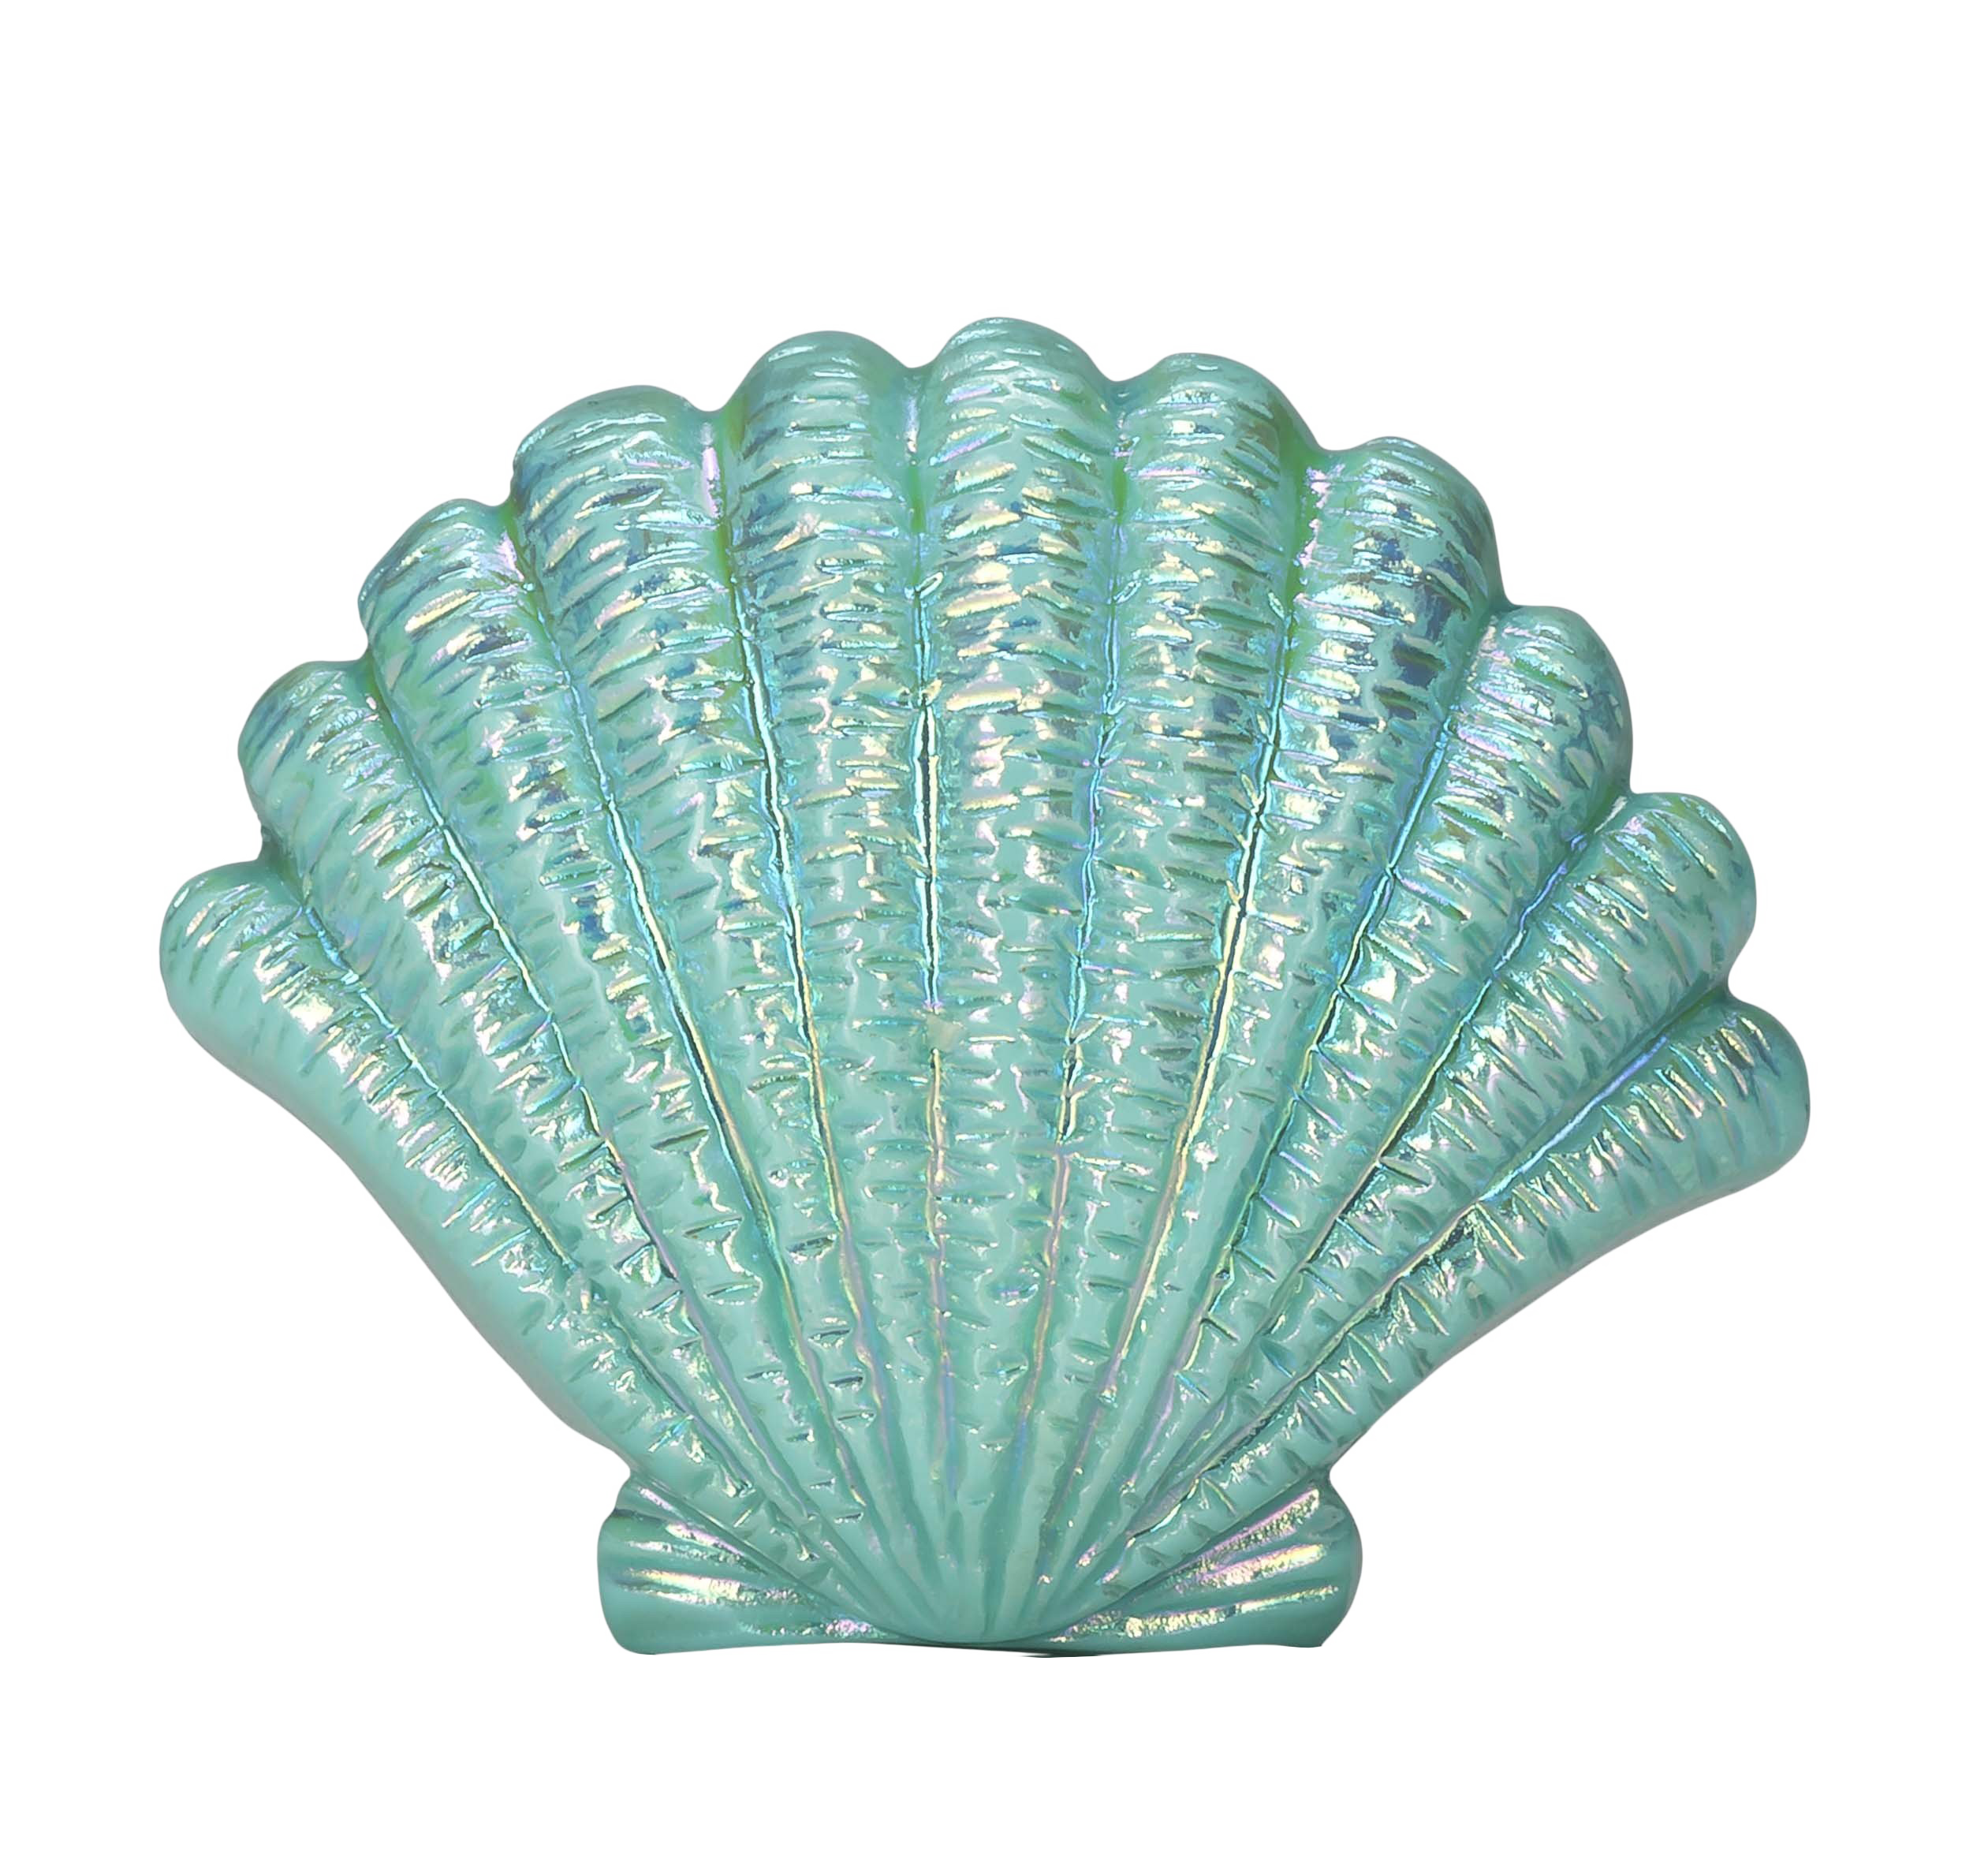 Shell clipart blue sea. Seashell png image purepng